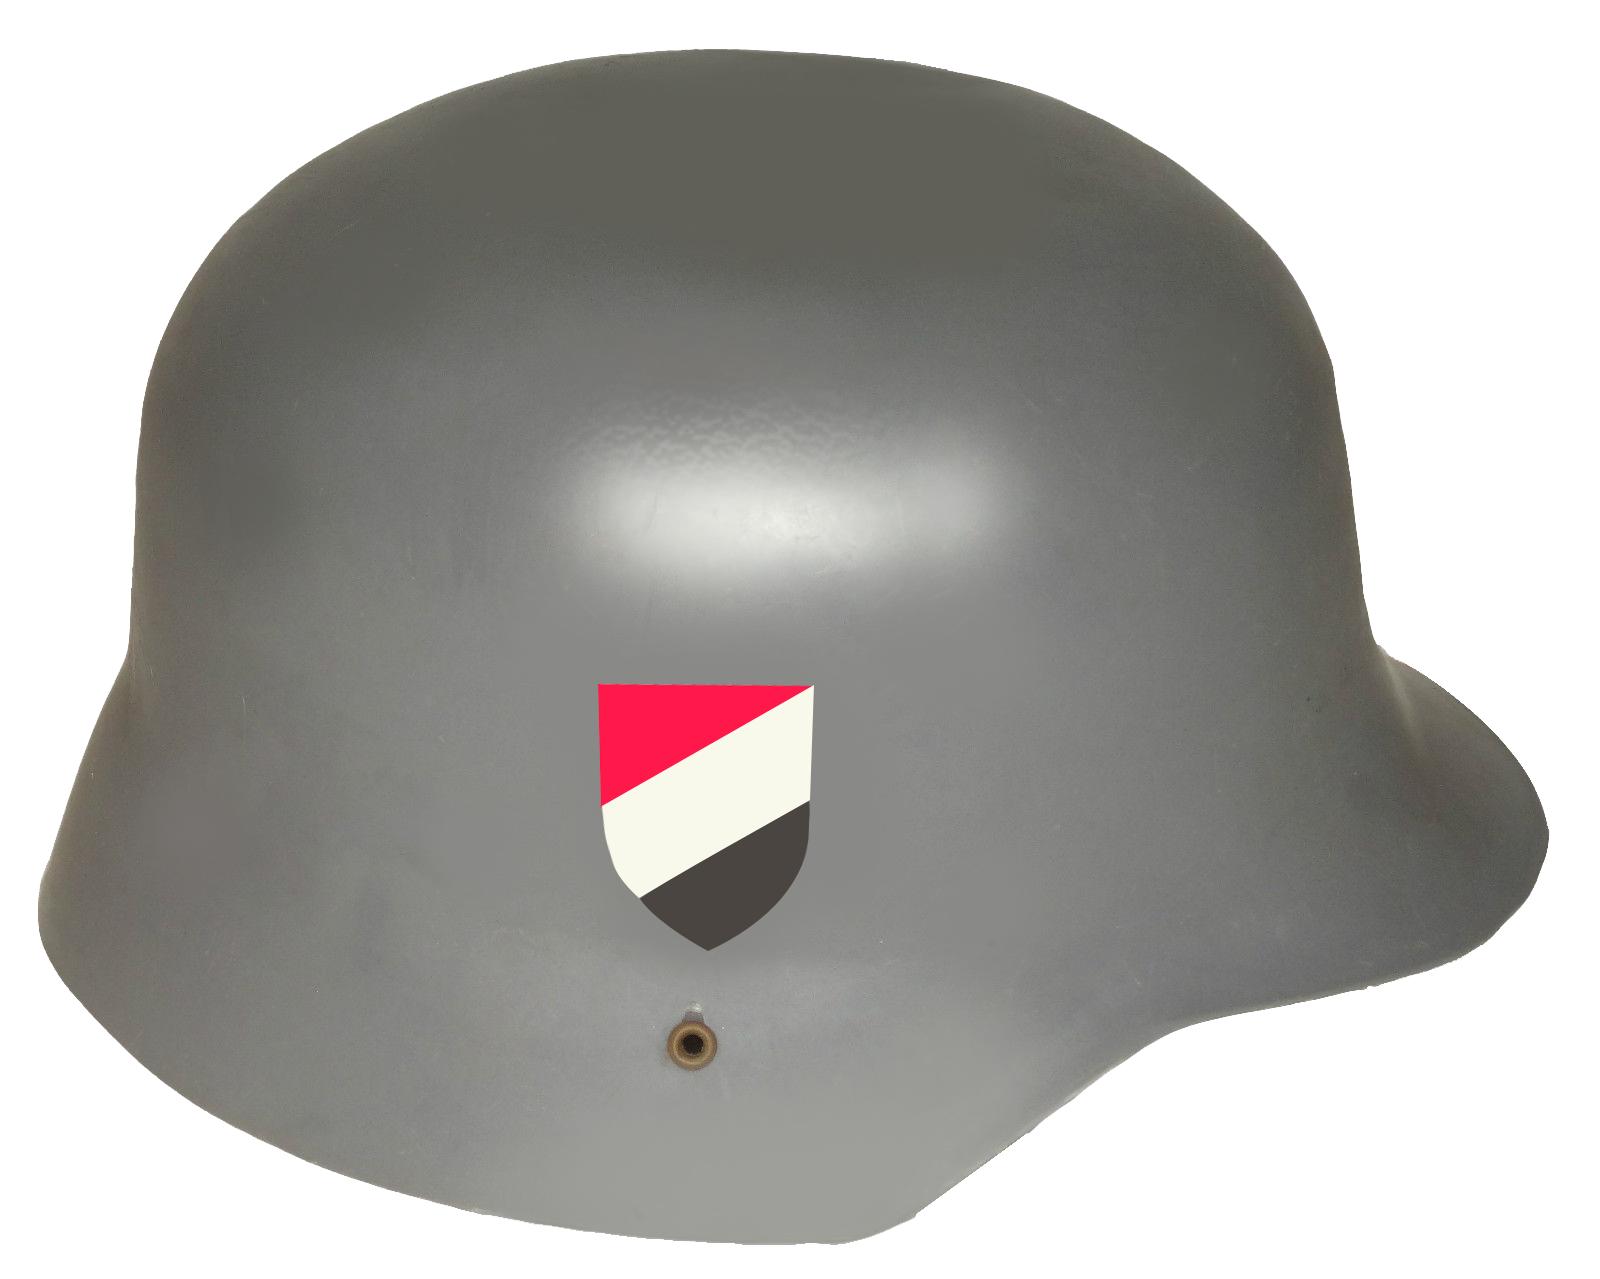 nazi armyl hat. Vietnam war helmet png